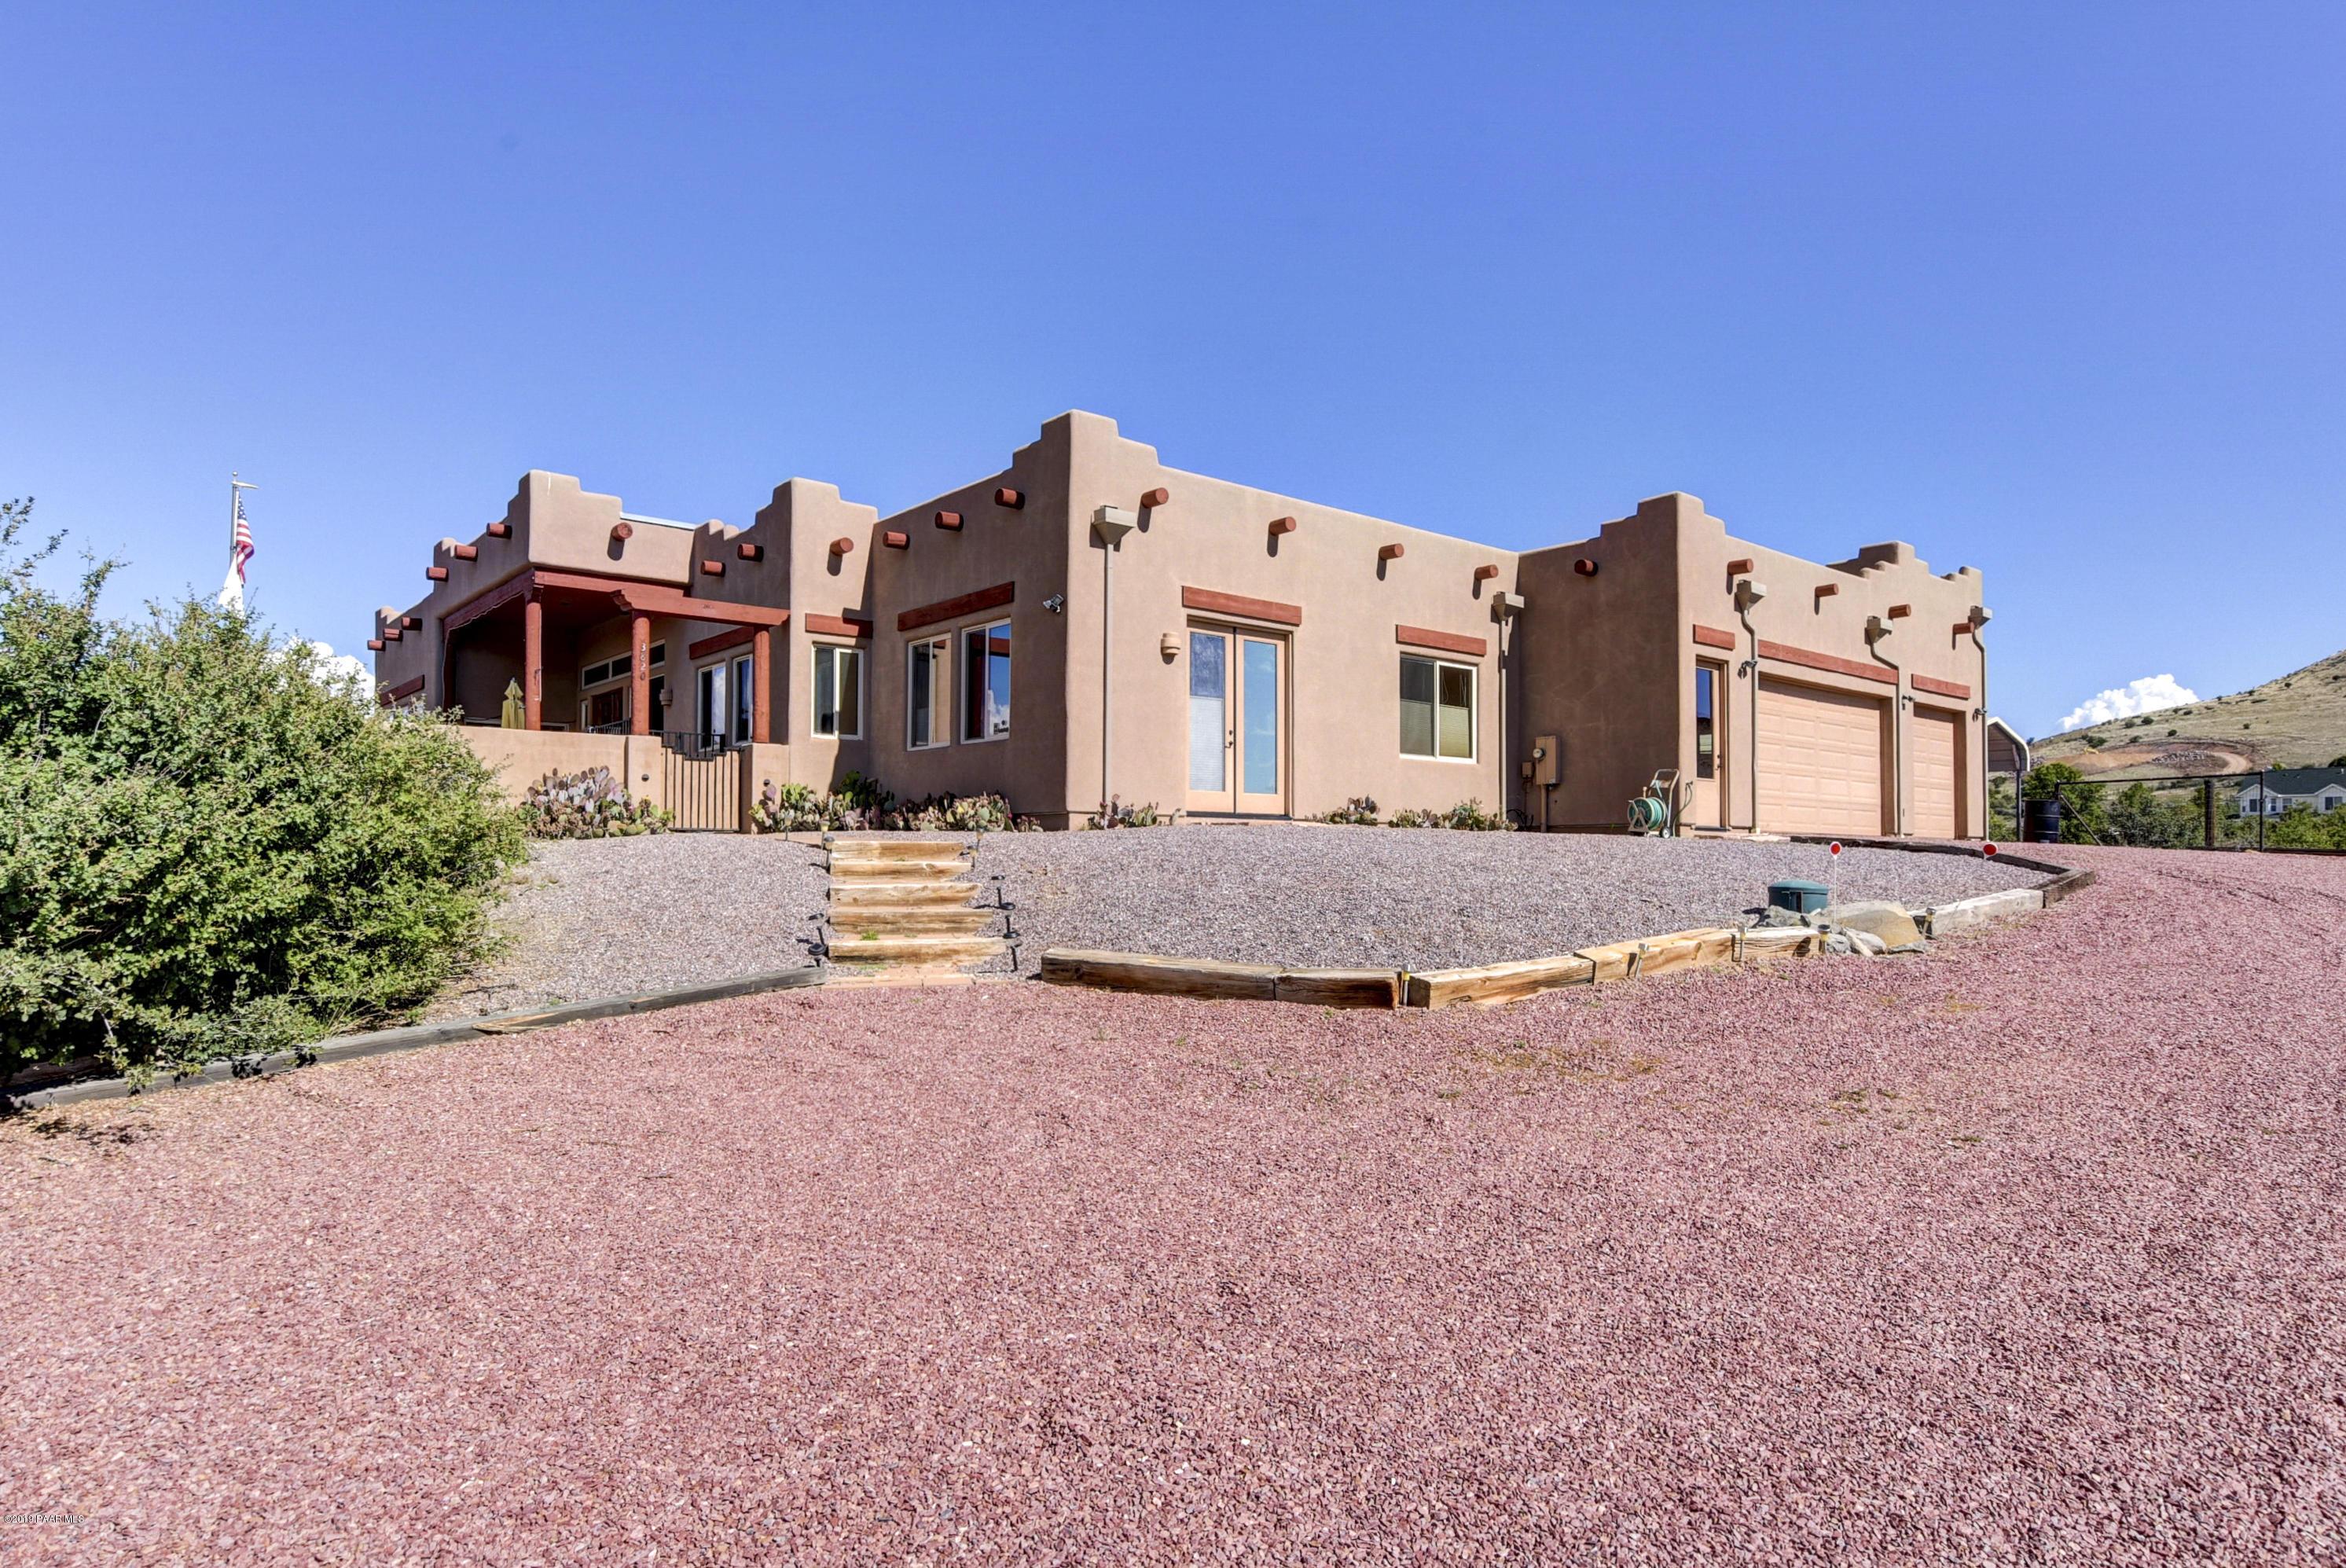 3820 W L Bar L Road, Prescott in Yavapai County, AZ 86305 Home for Sale